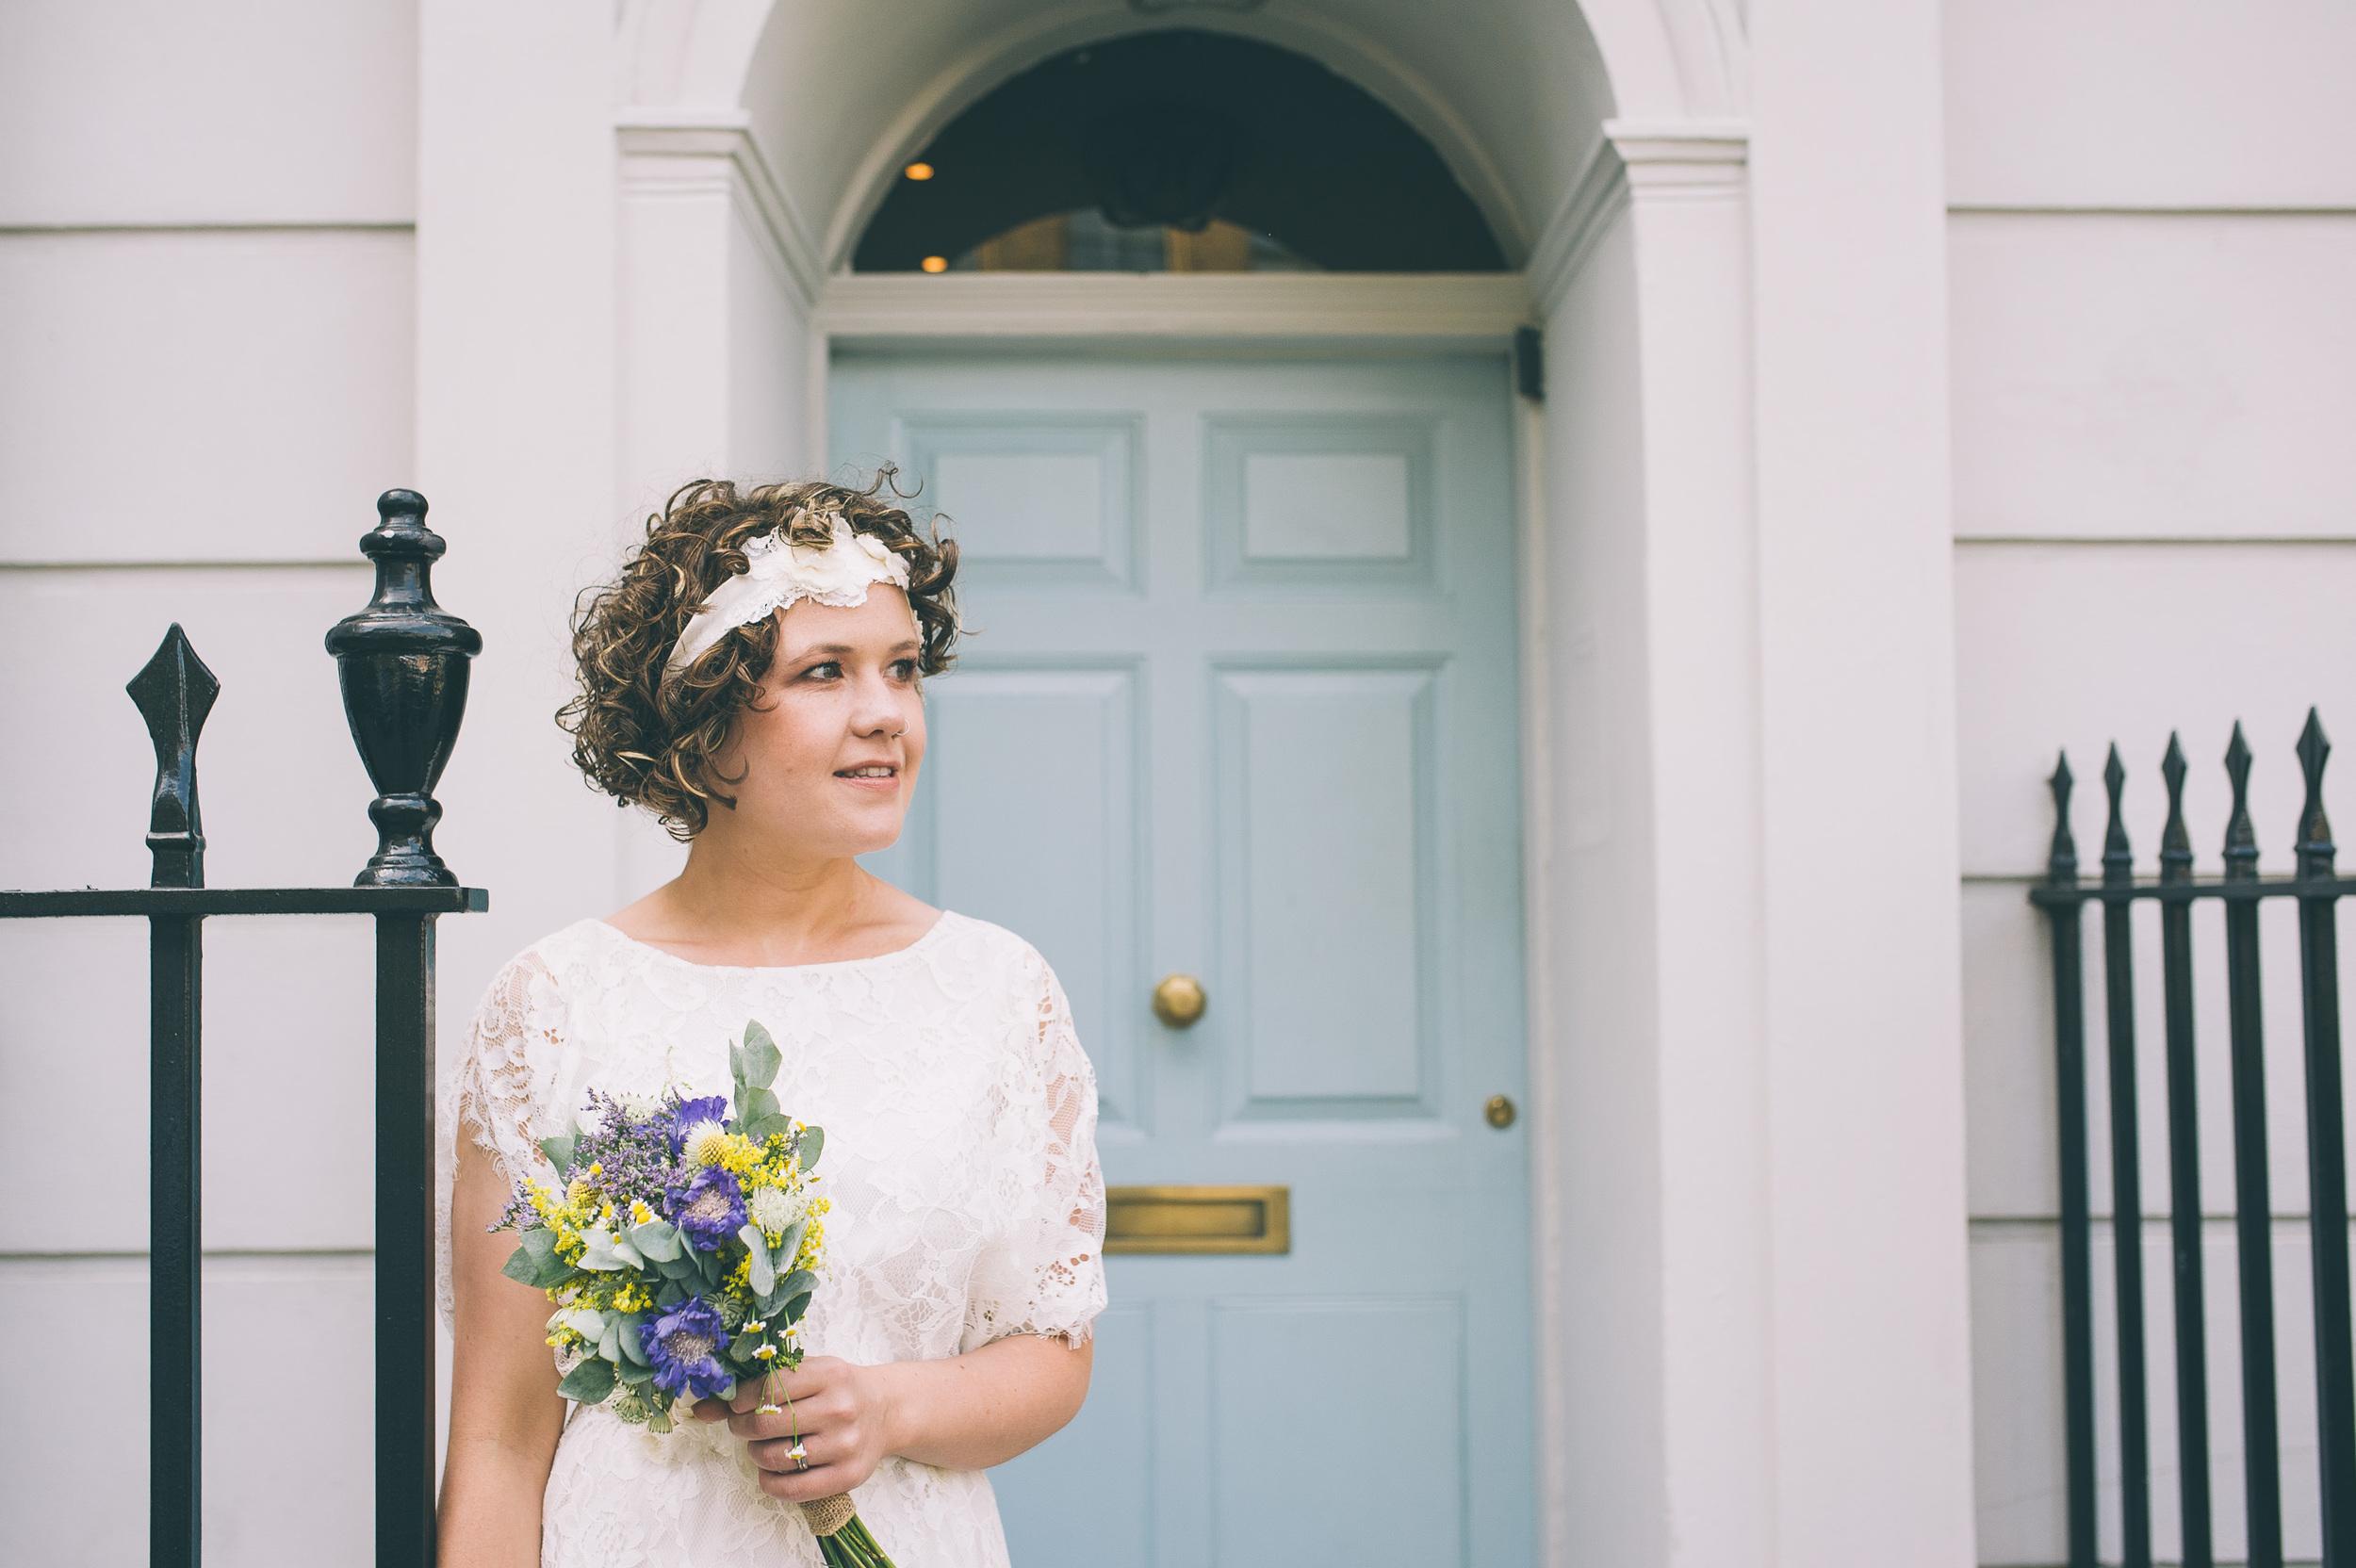 London bride with bouquet